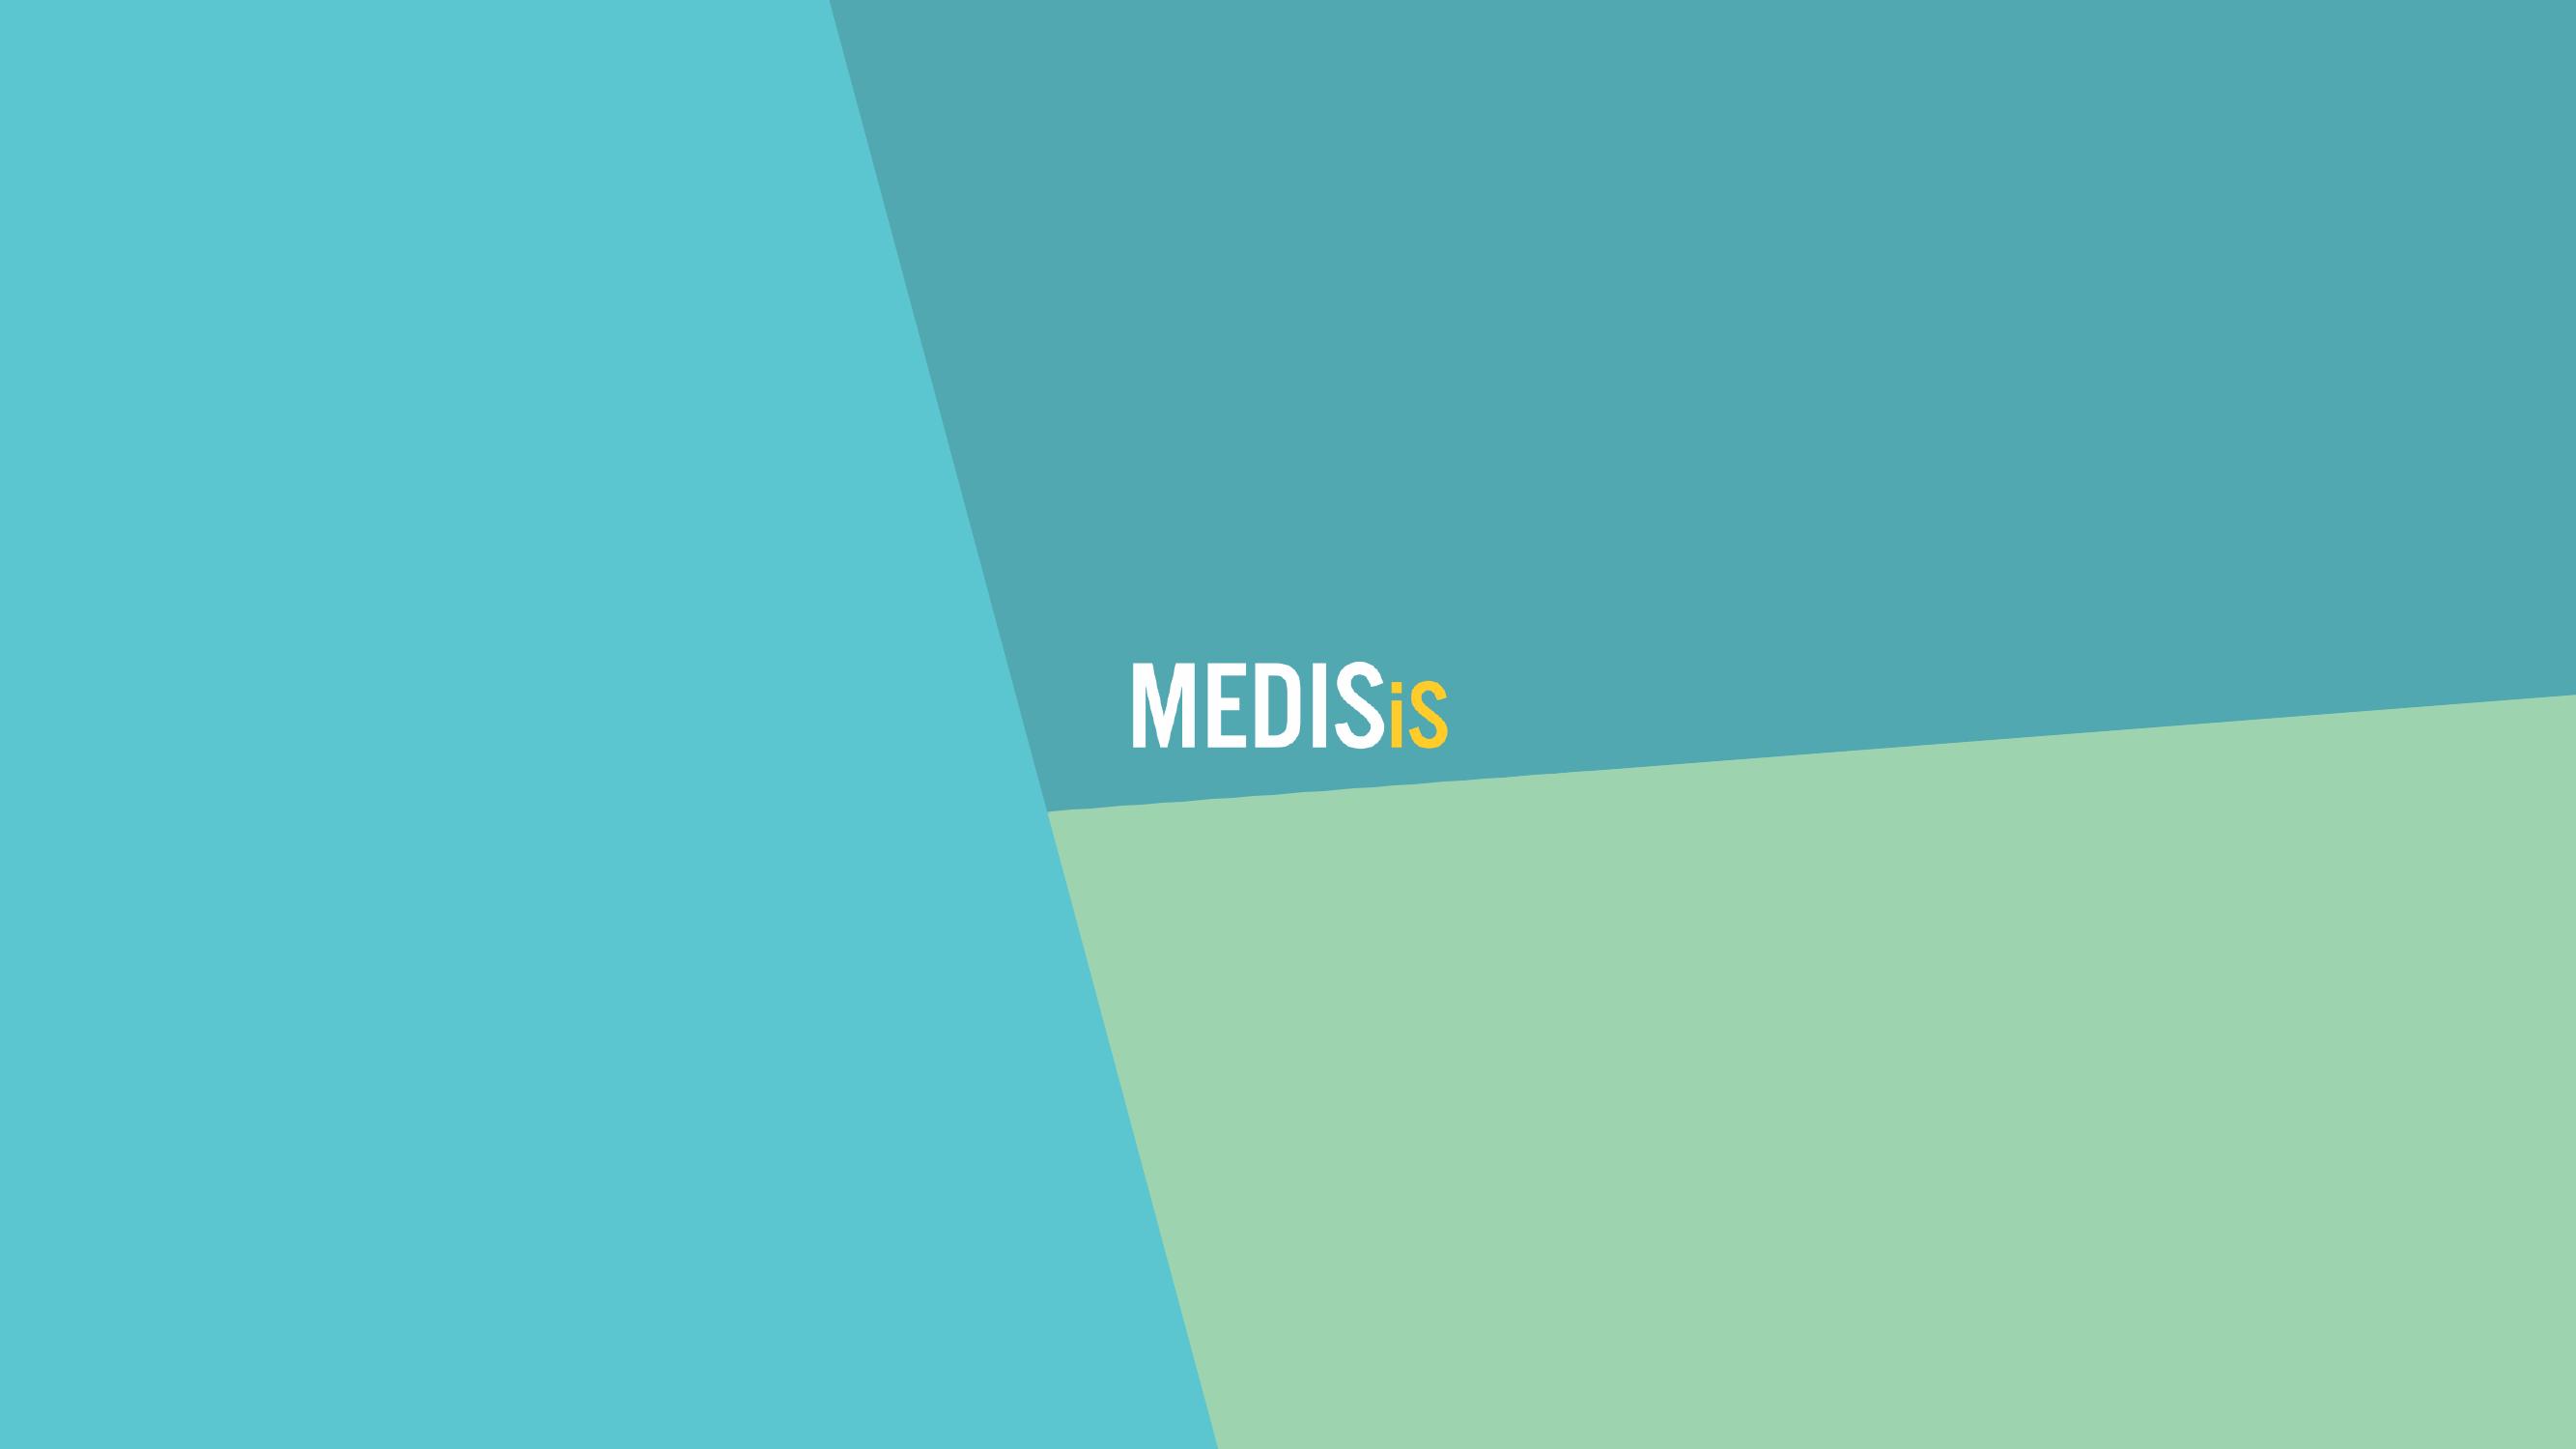 medisis background